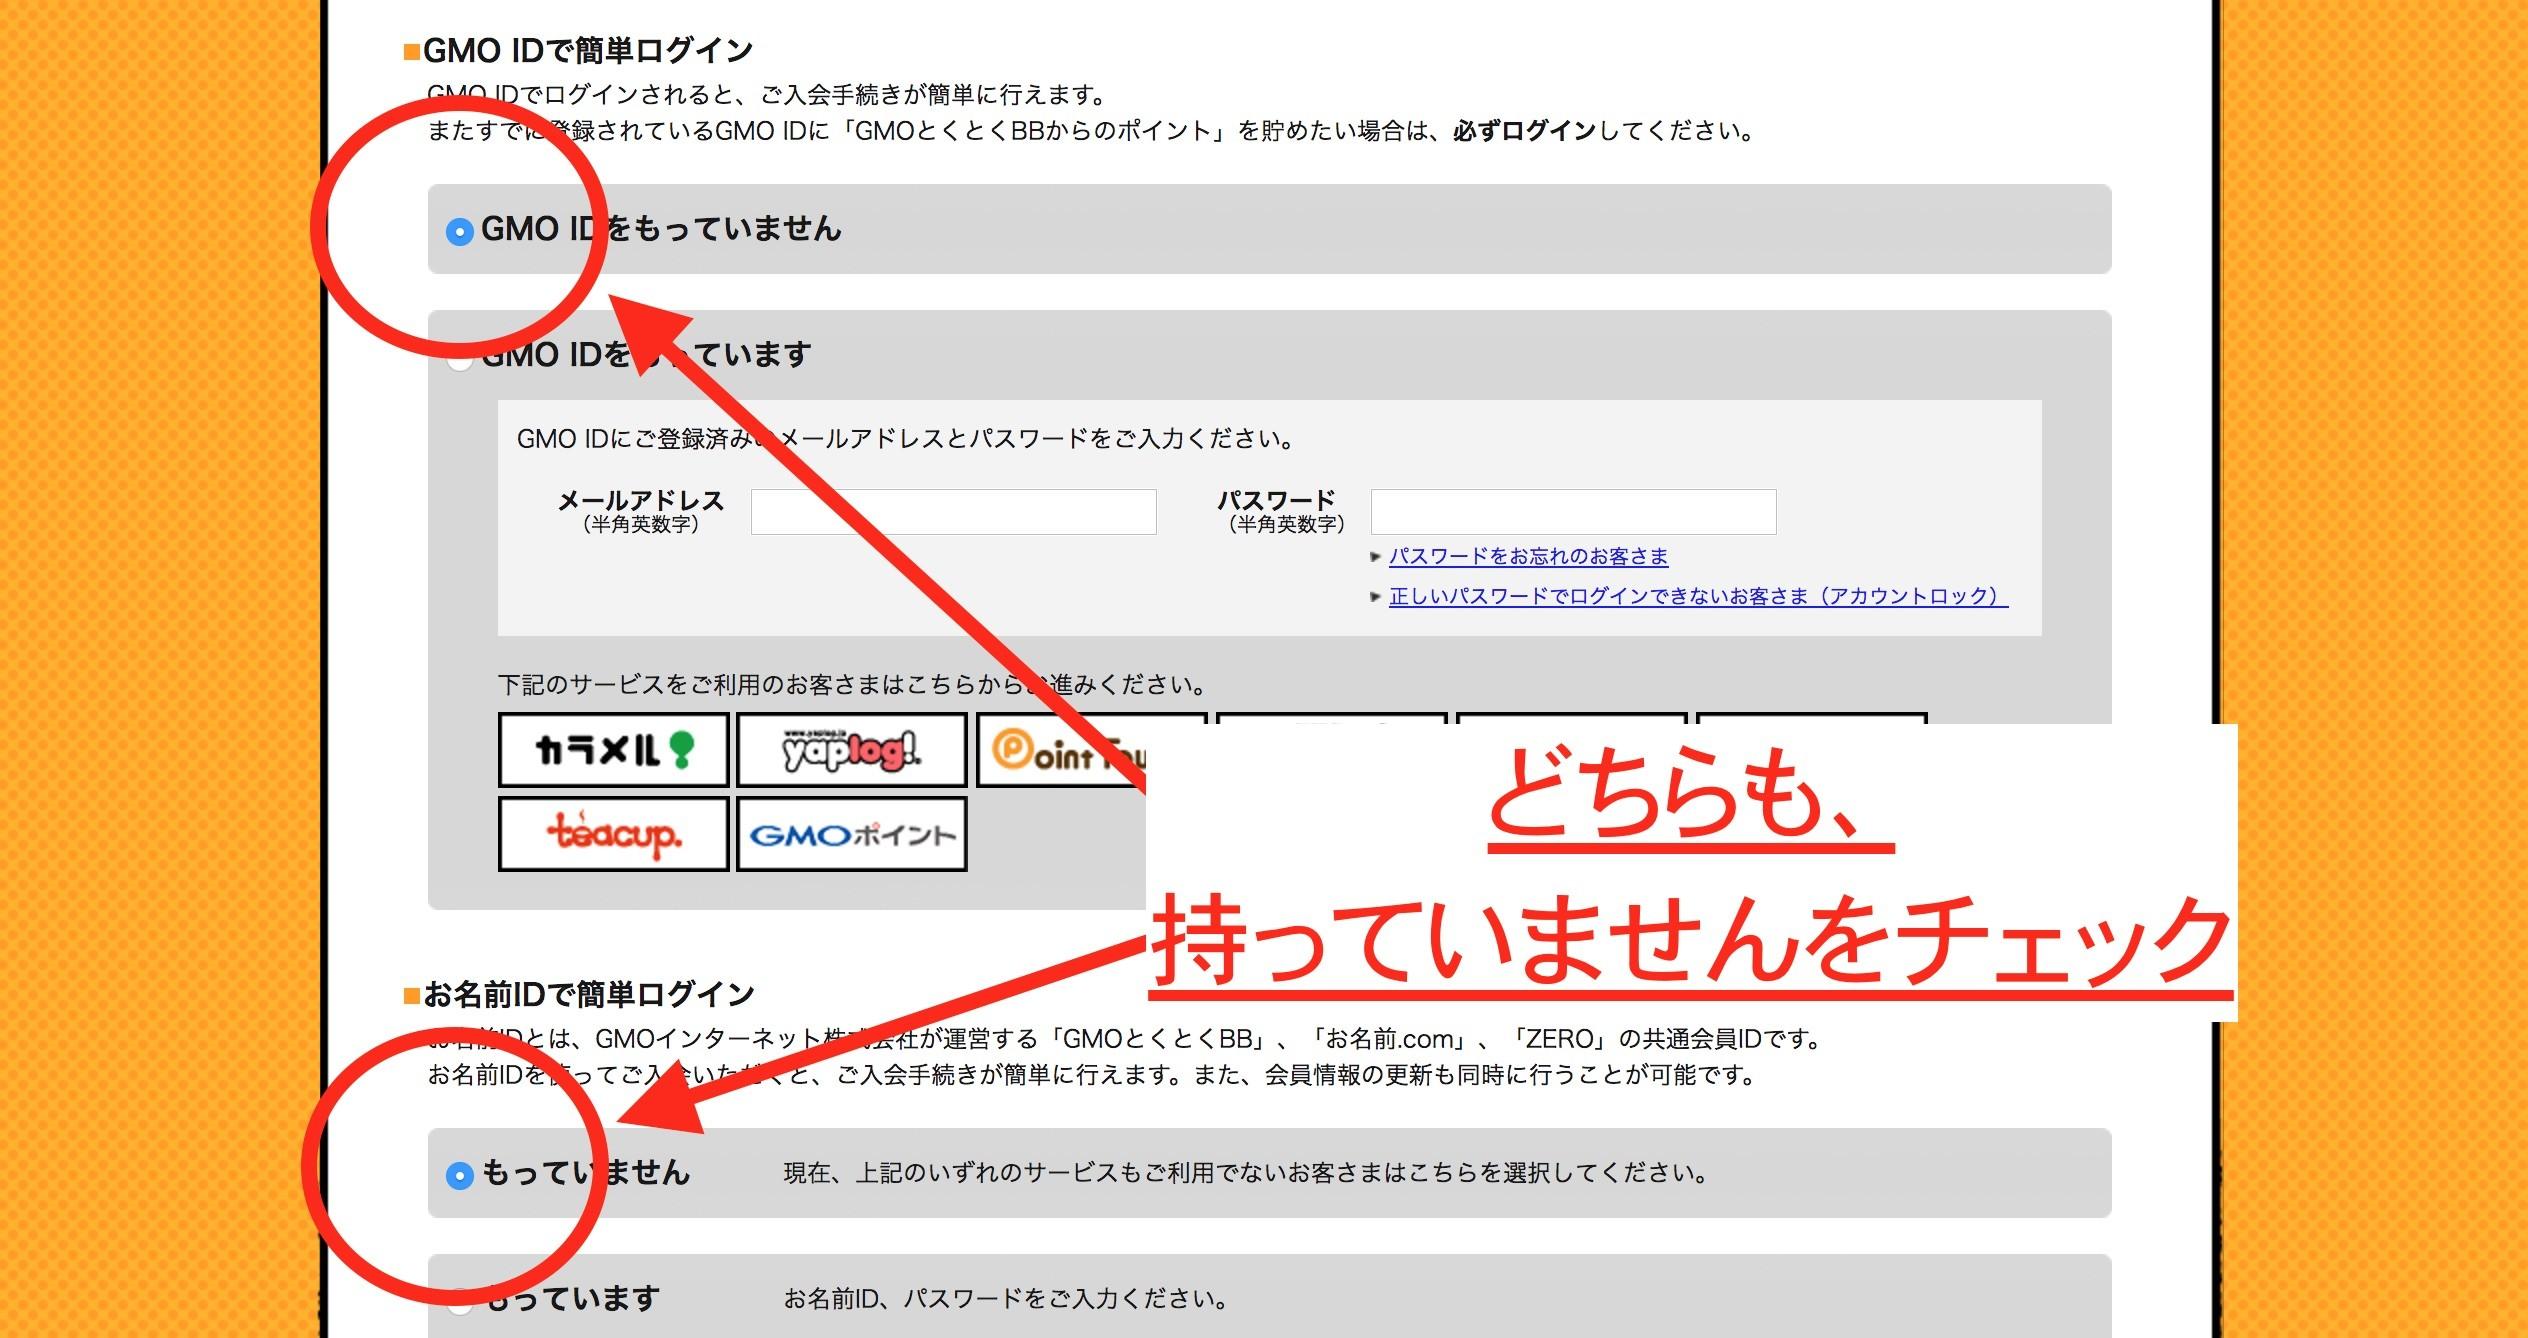 GMO IDの選択画面